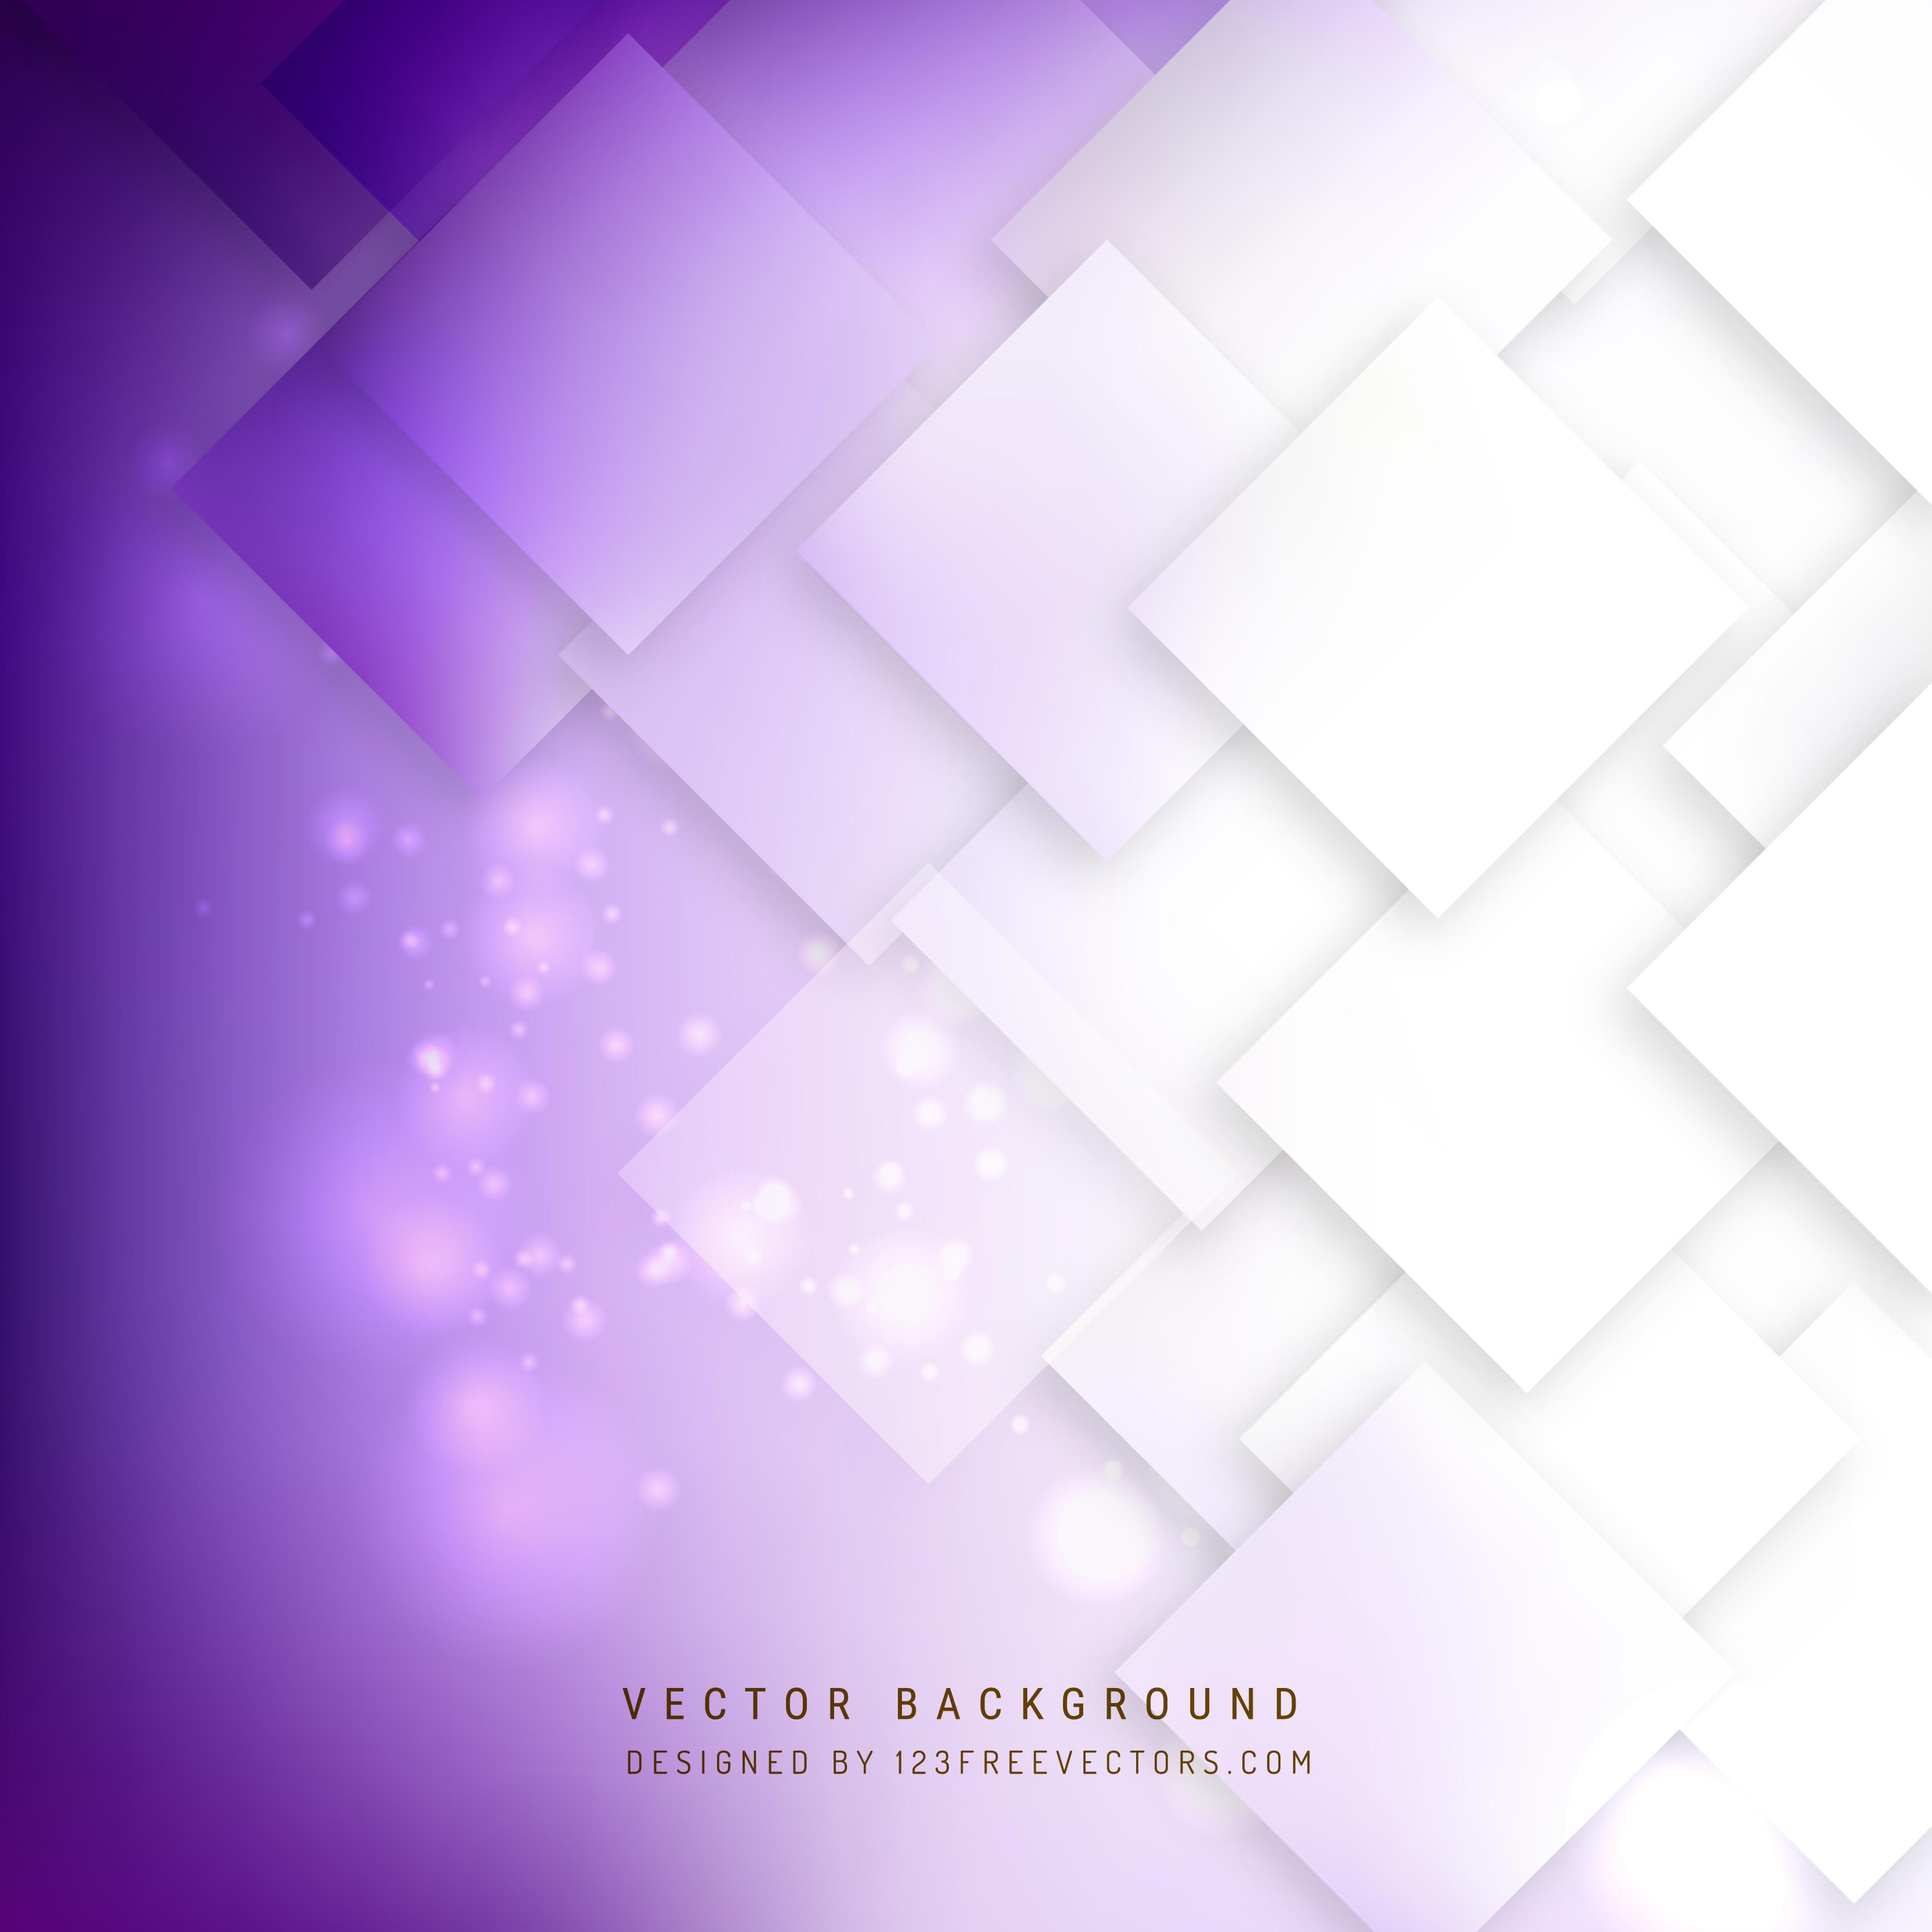 lavender background design - photo #14